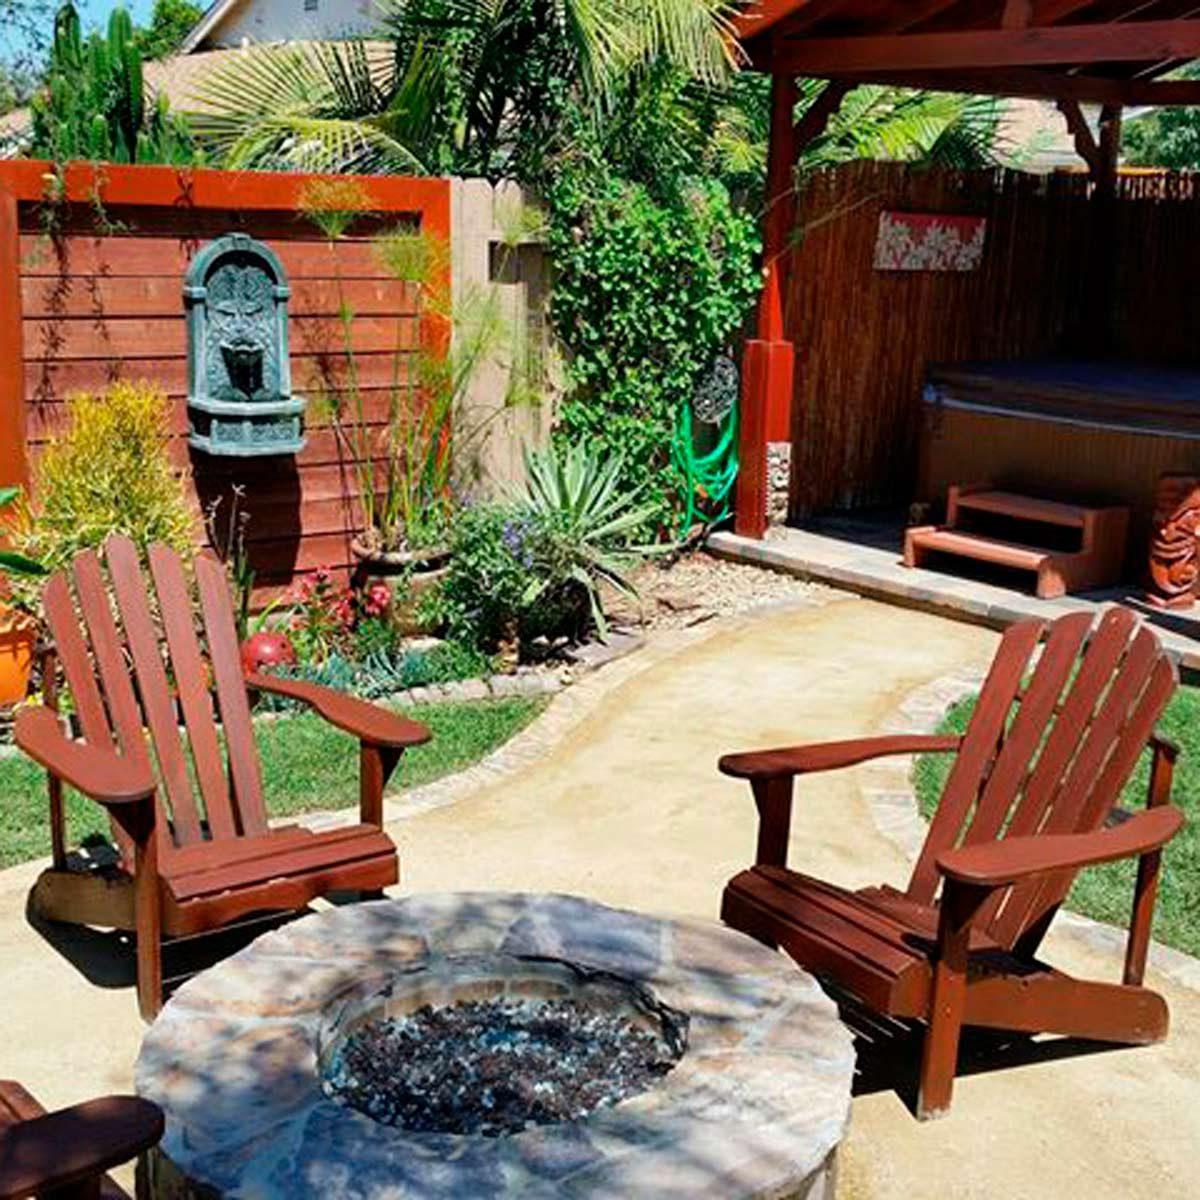 Fullsize Of Diy Backyard Oasis